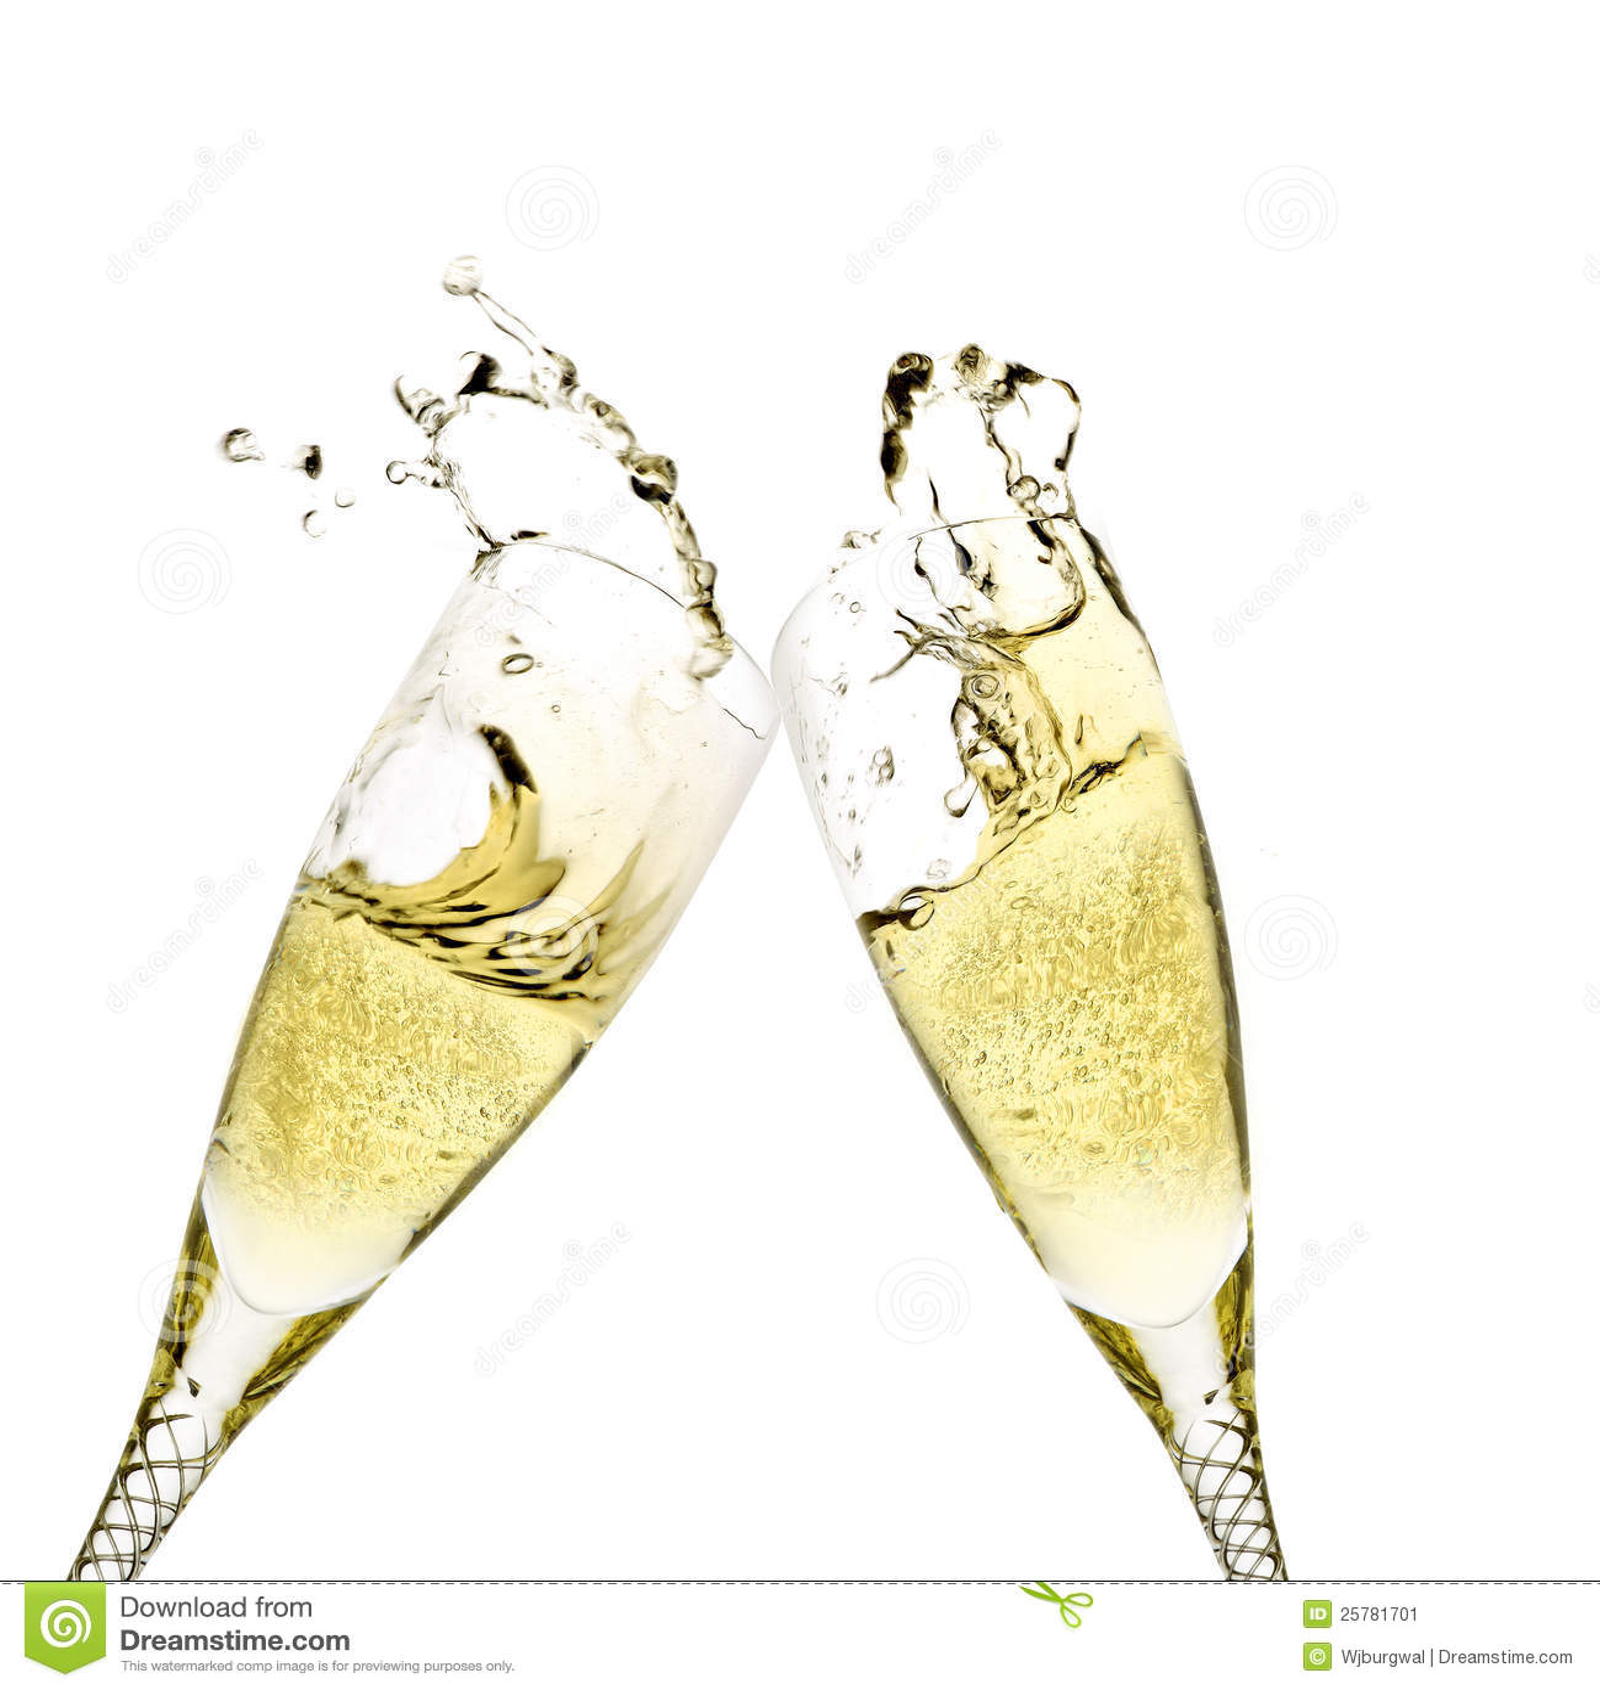 Champagne Stock Image - Image: 25781701